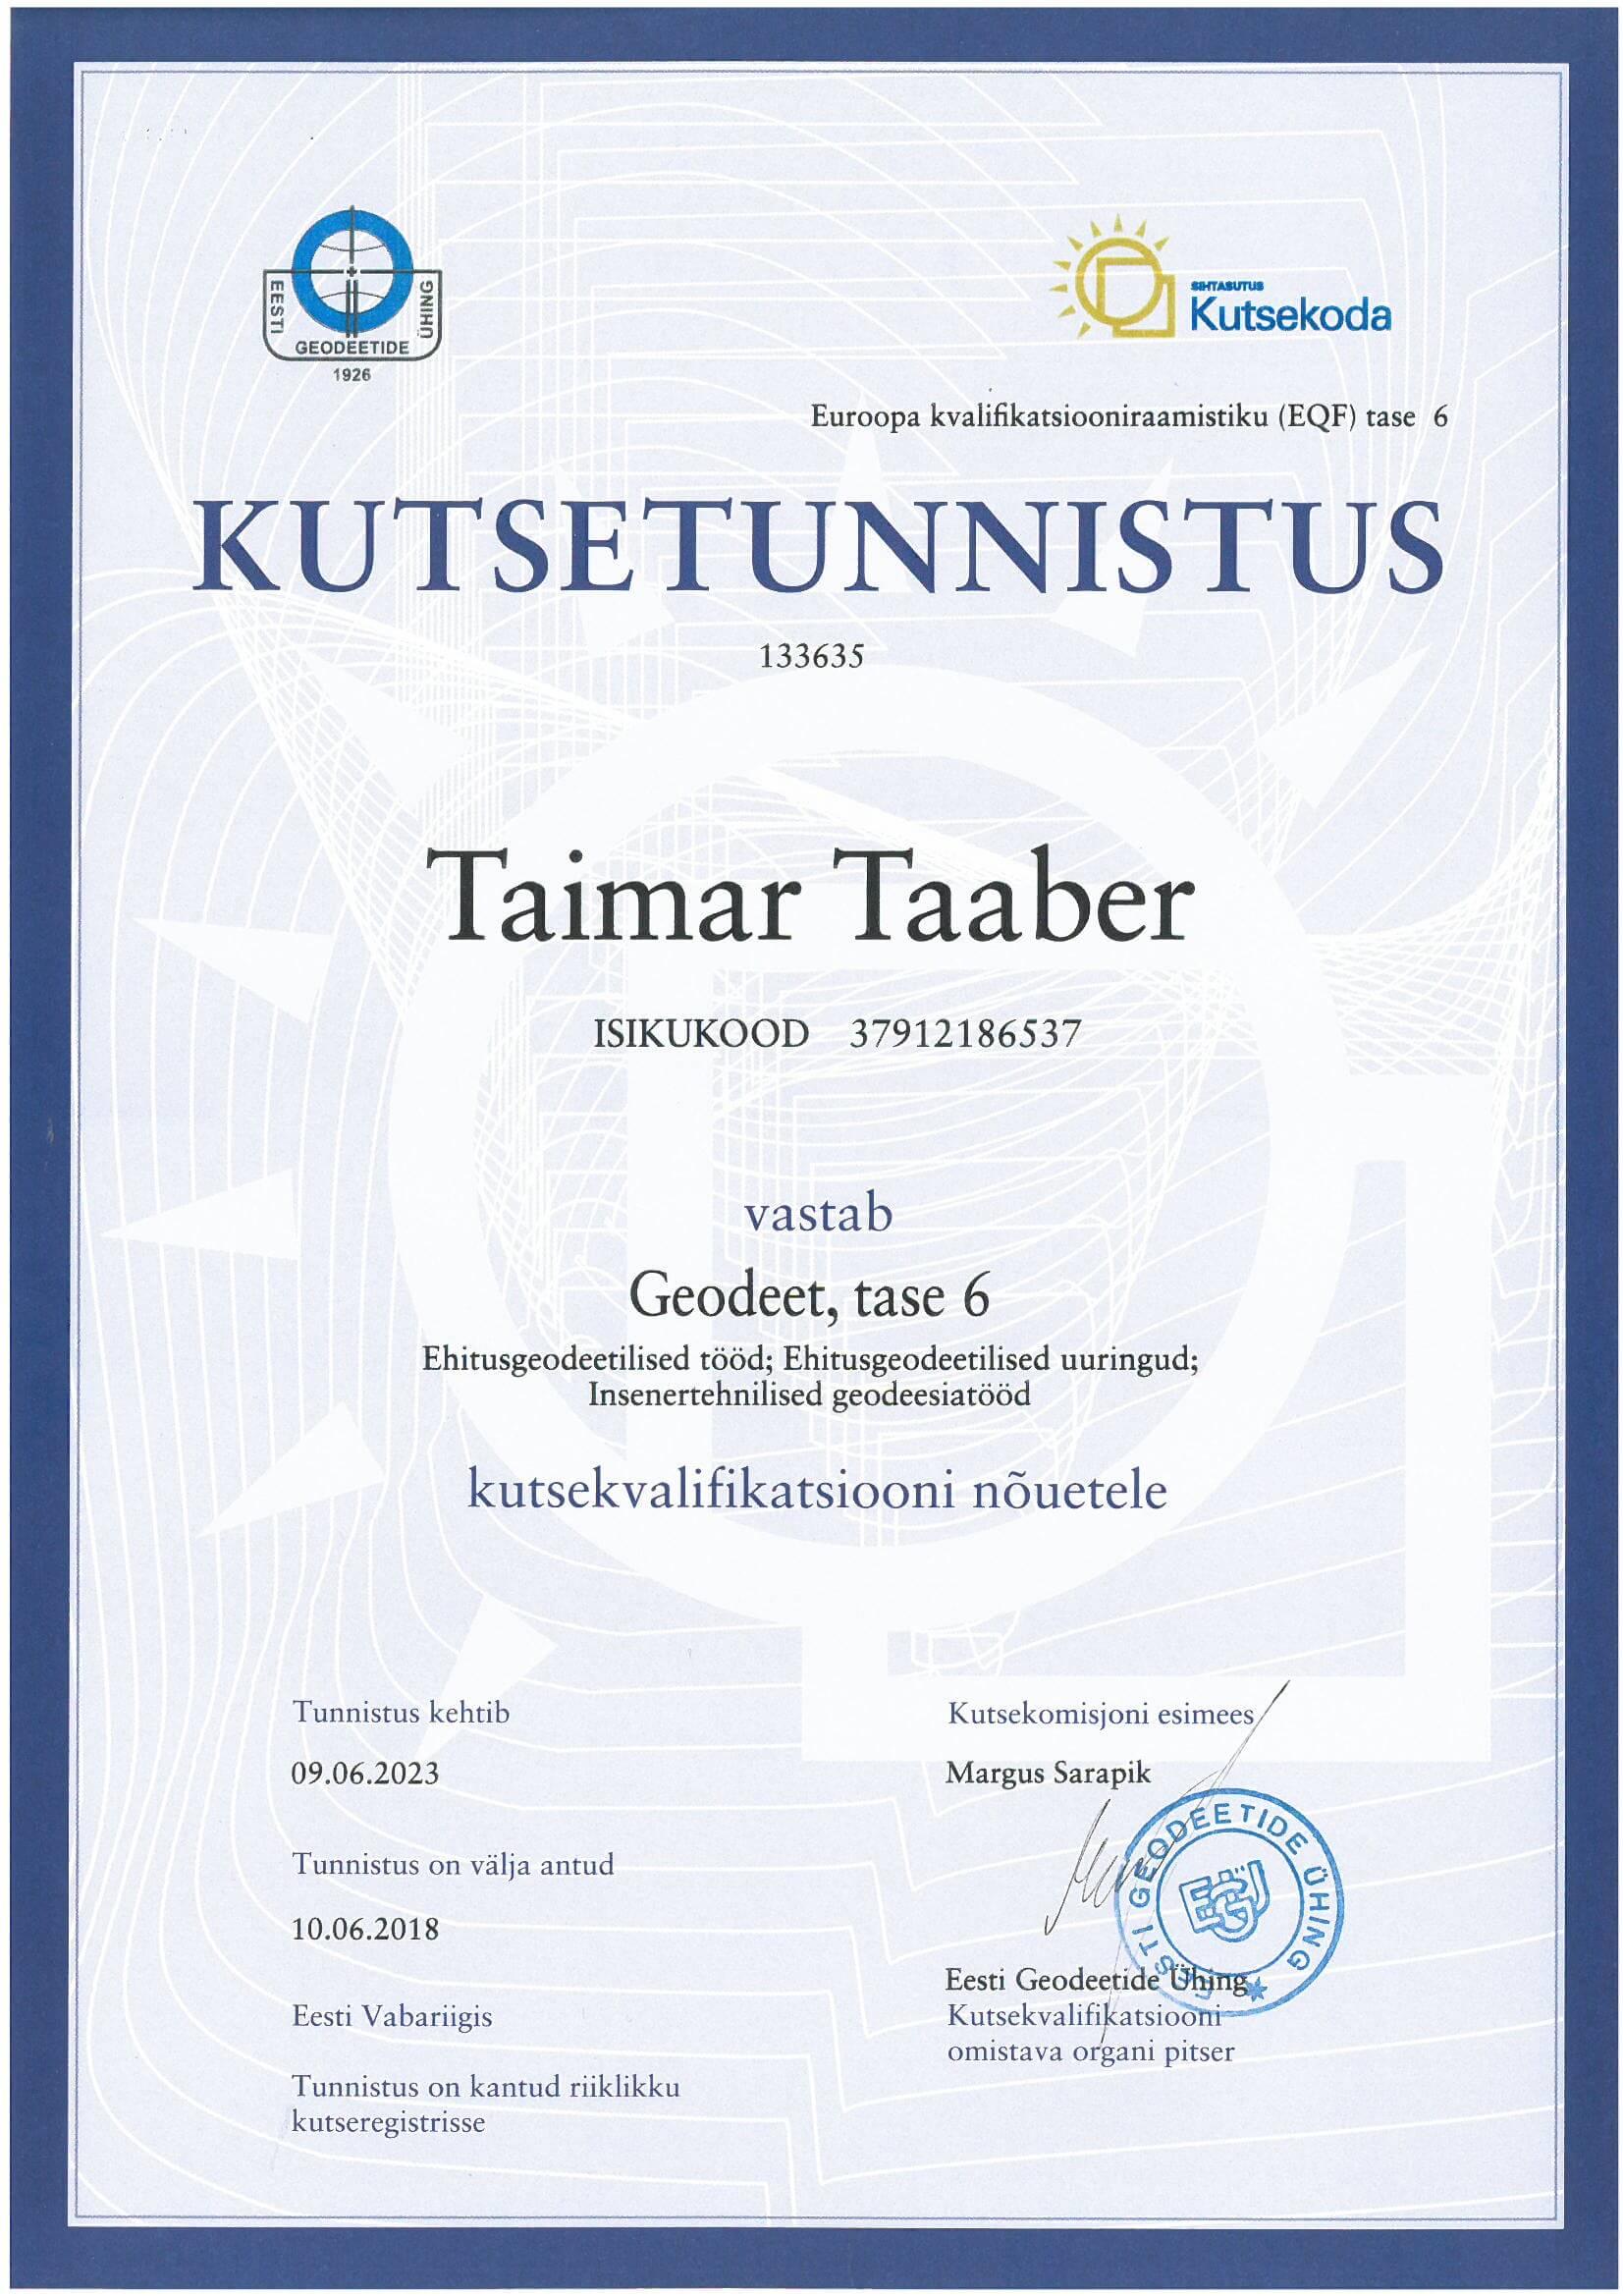 Kutsetunnistus Taimar Taaber